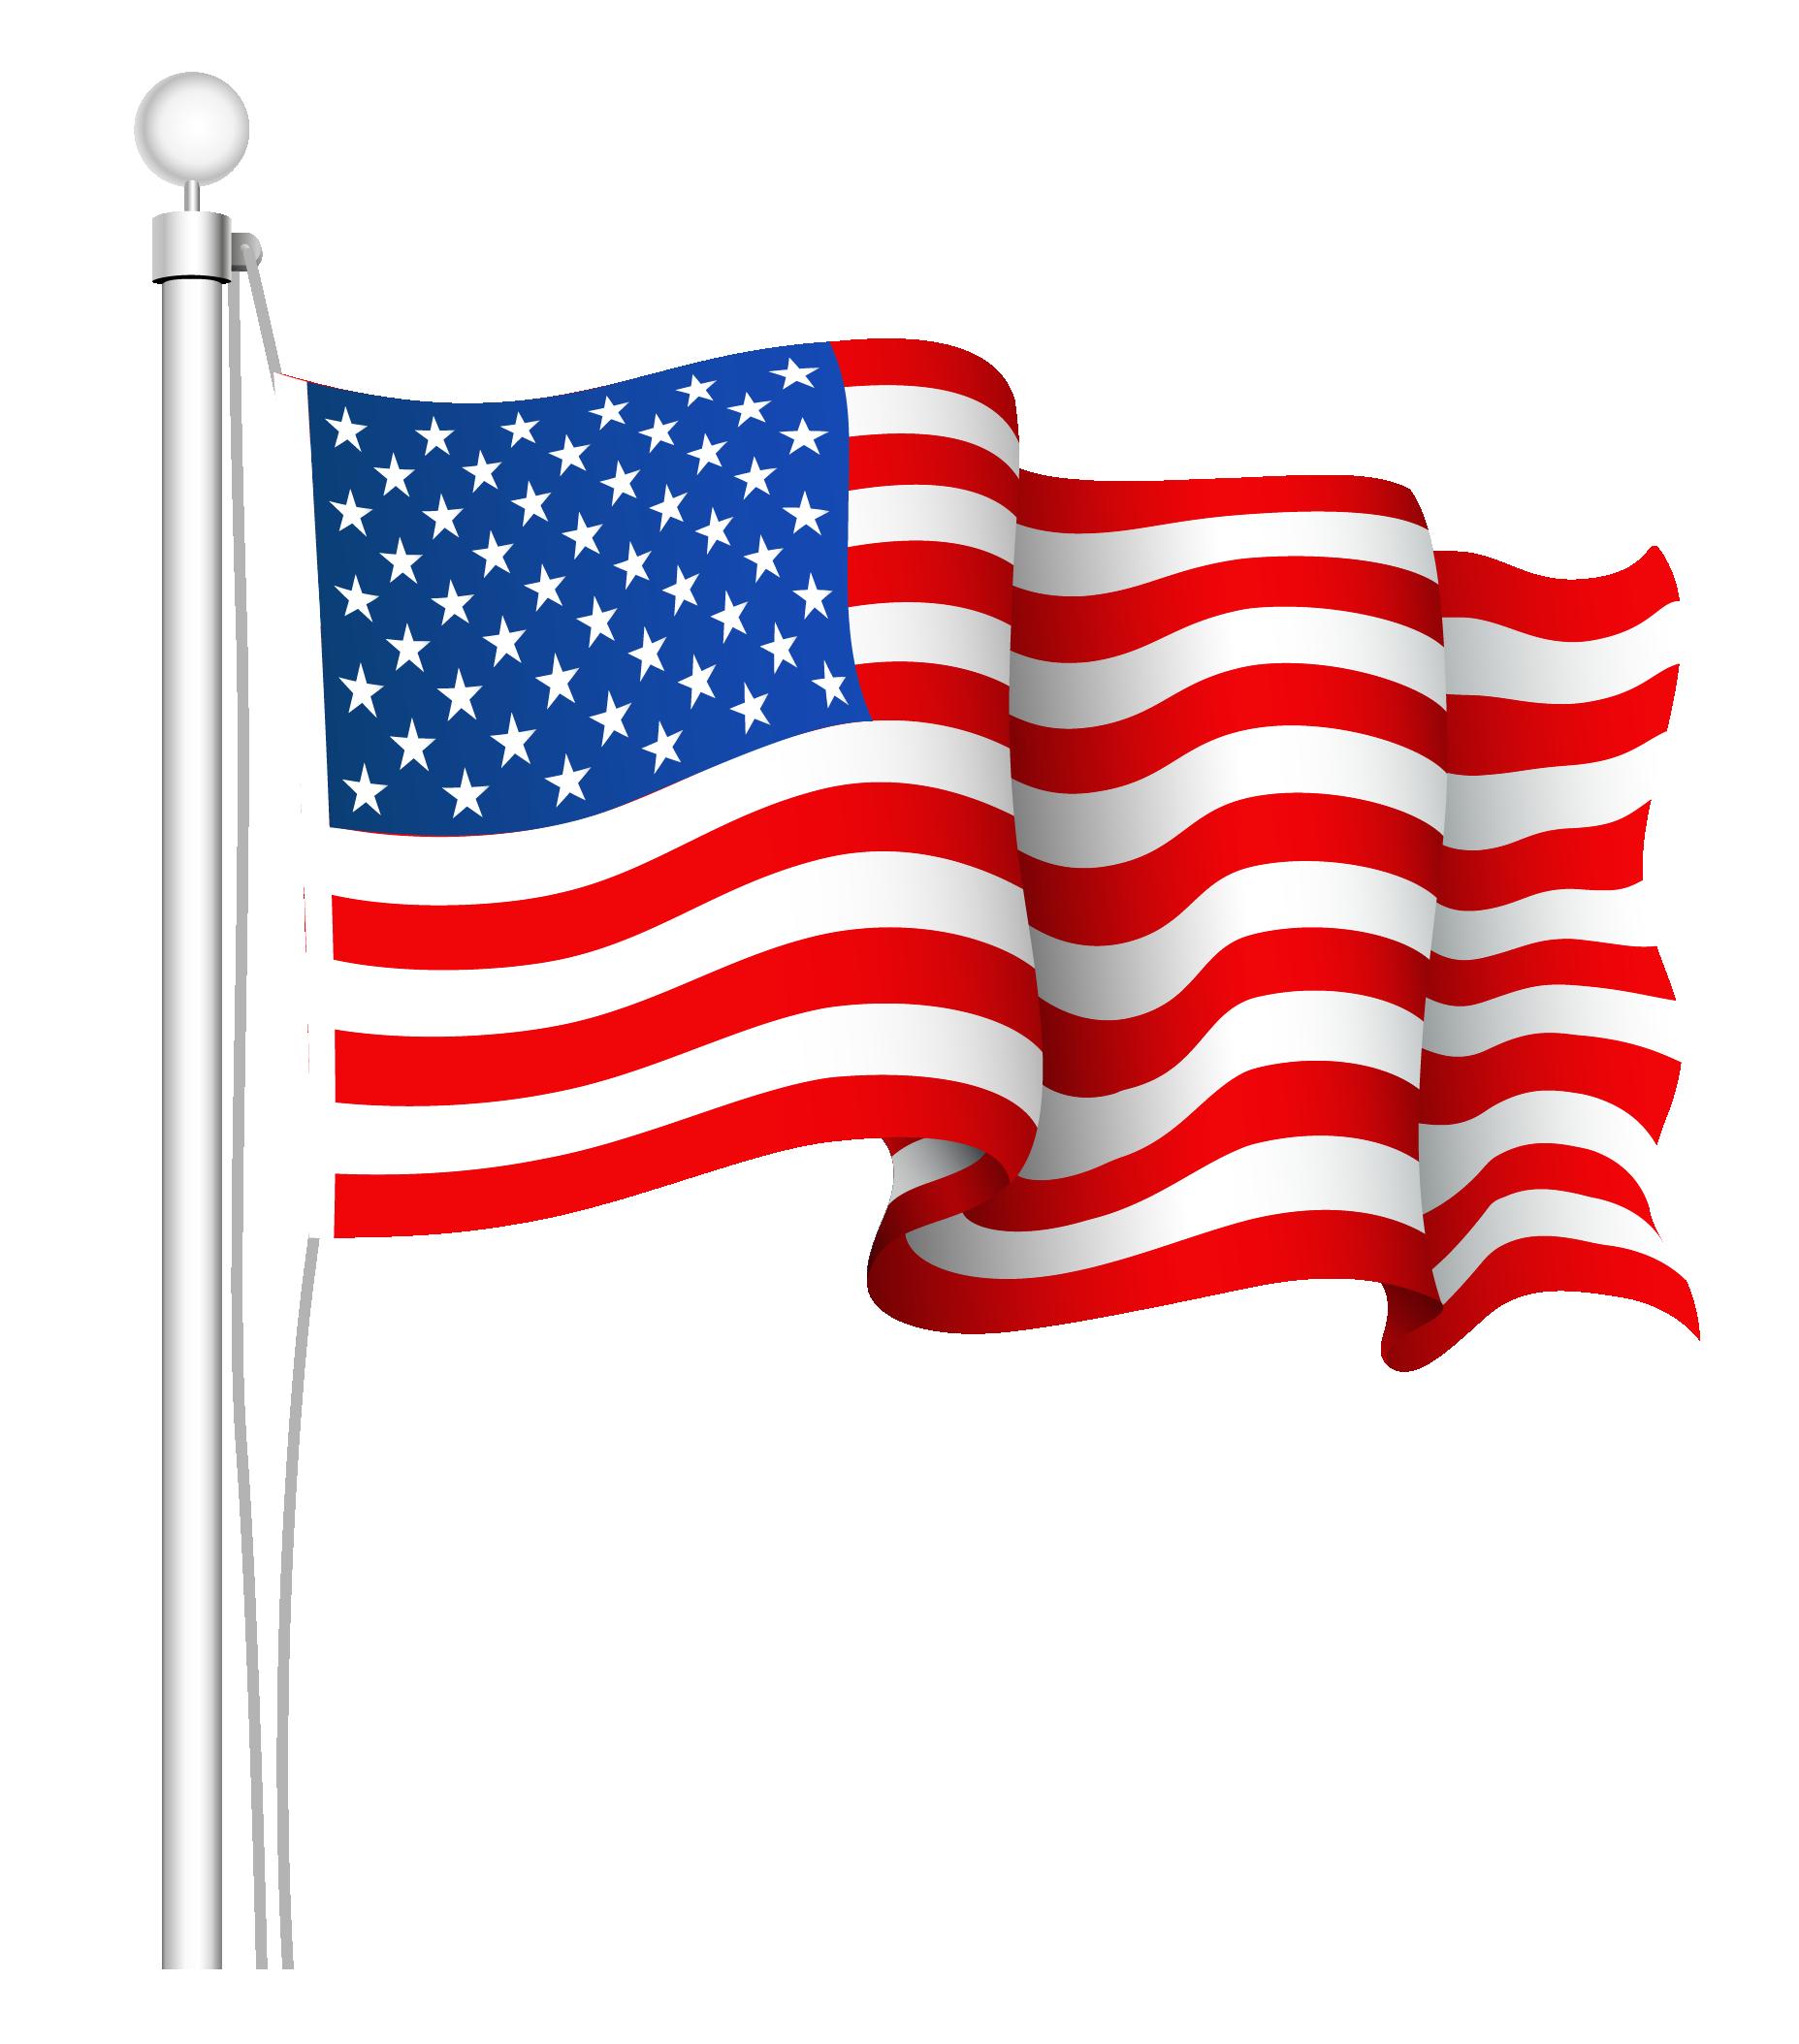 Clip art flag free usa dromfei top